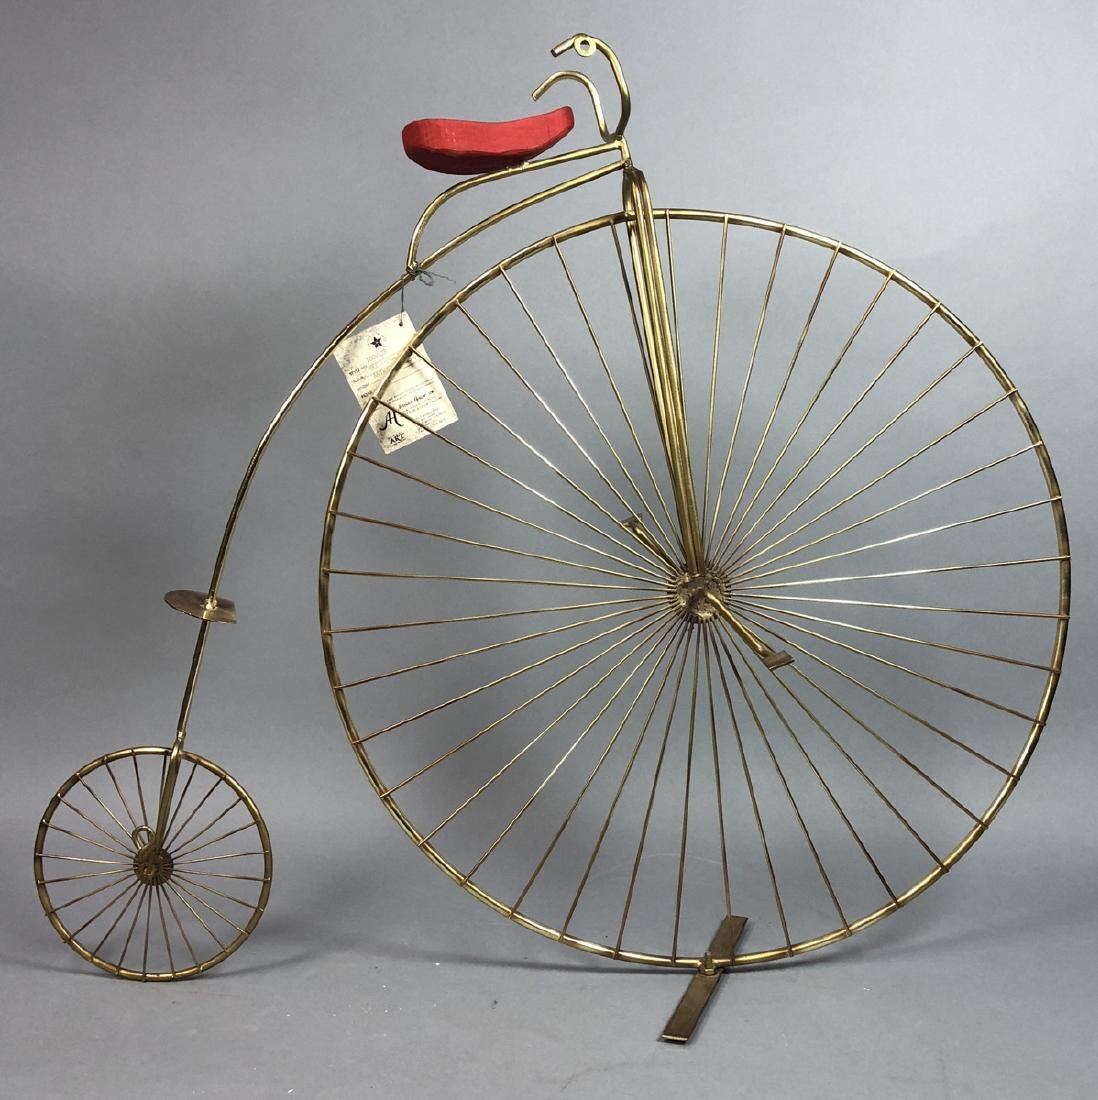 C JERE For ARTISAN HOUSE Big Wheel Bike Sculpture